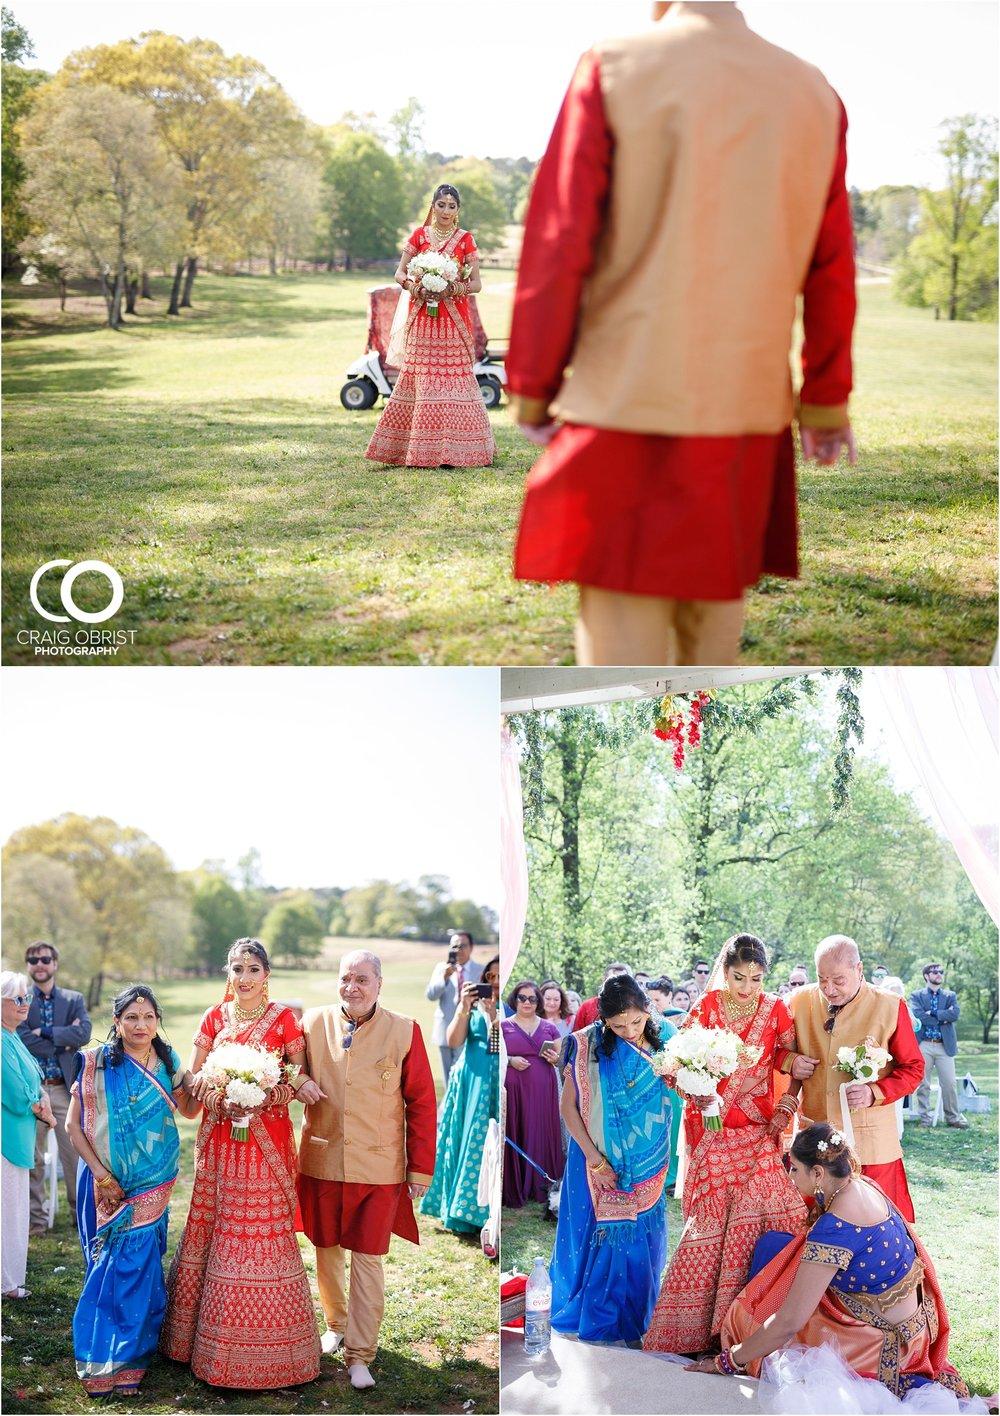 Chukkar Farm Polo Club Events & Weddings Craig Obrist_0075.jpg